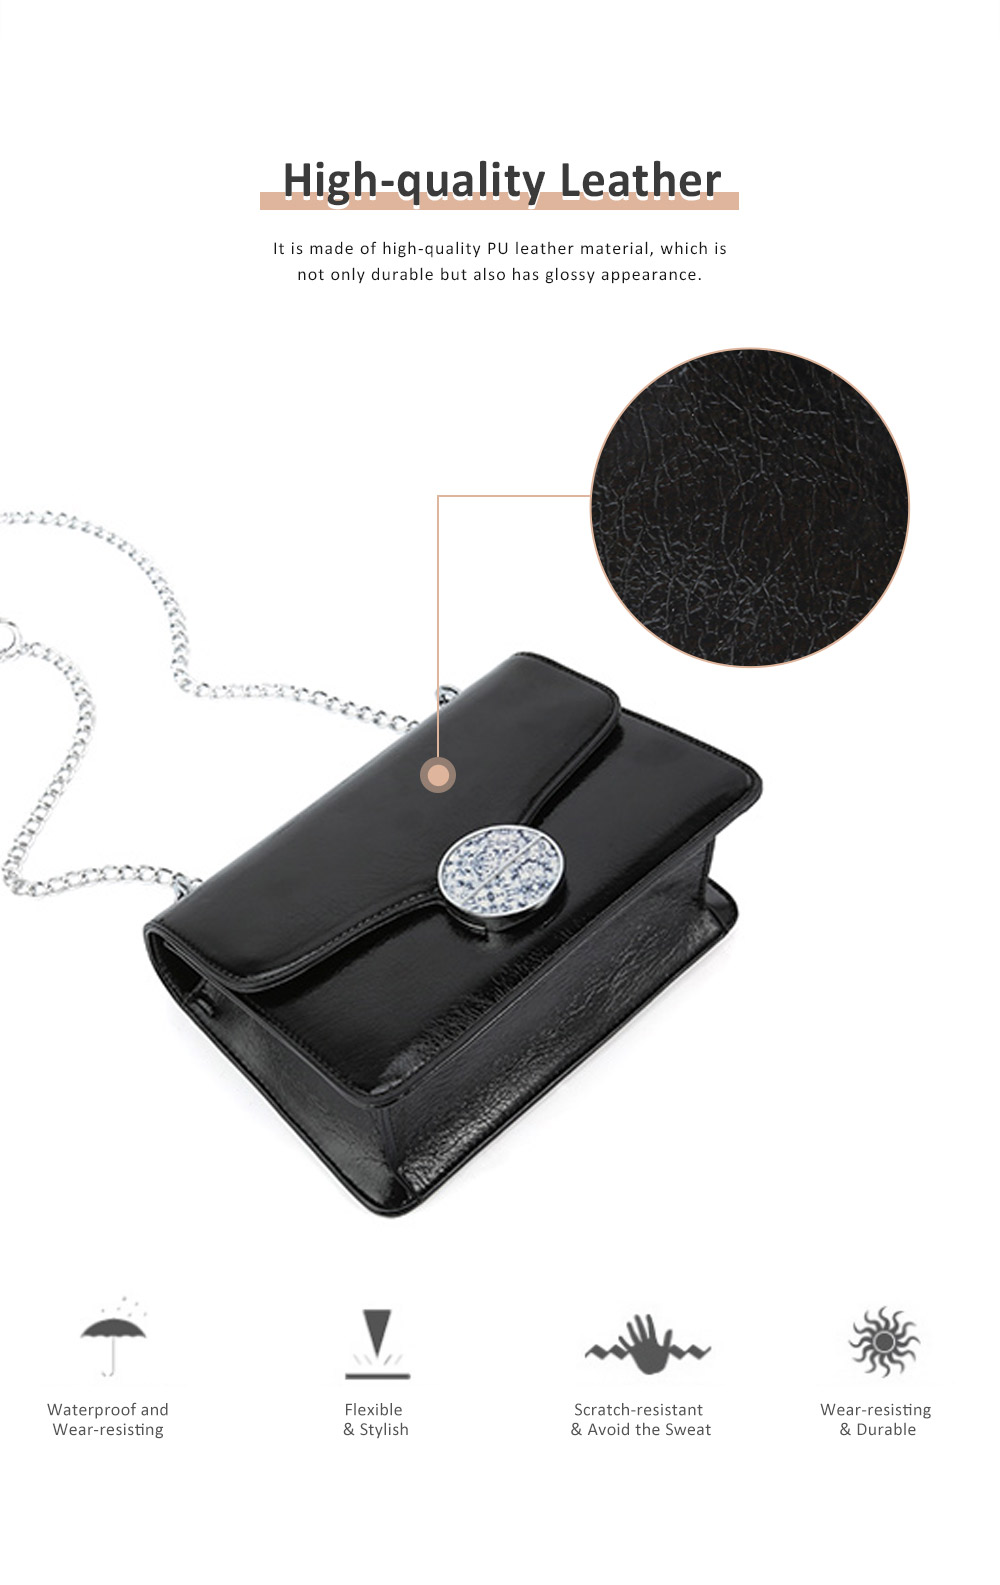 Marble Buckle Metal Chain Square Bag, High-quality PU Leather Handbag with Strap, Black Slanted Straddle Bag Single Shoulder Bag 3